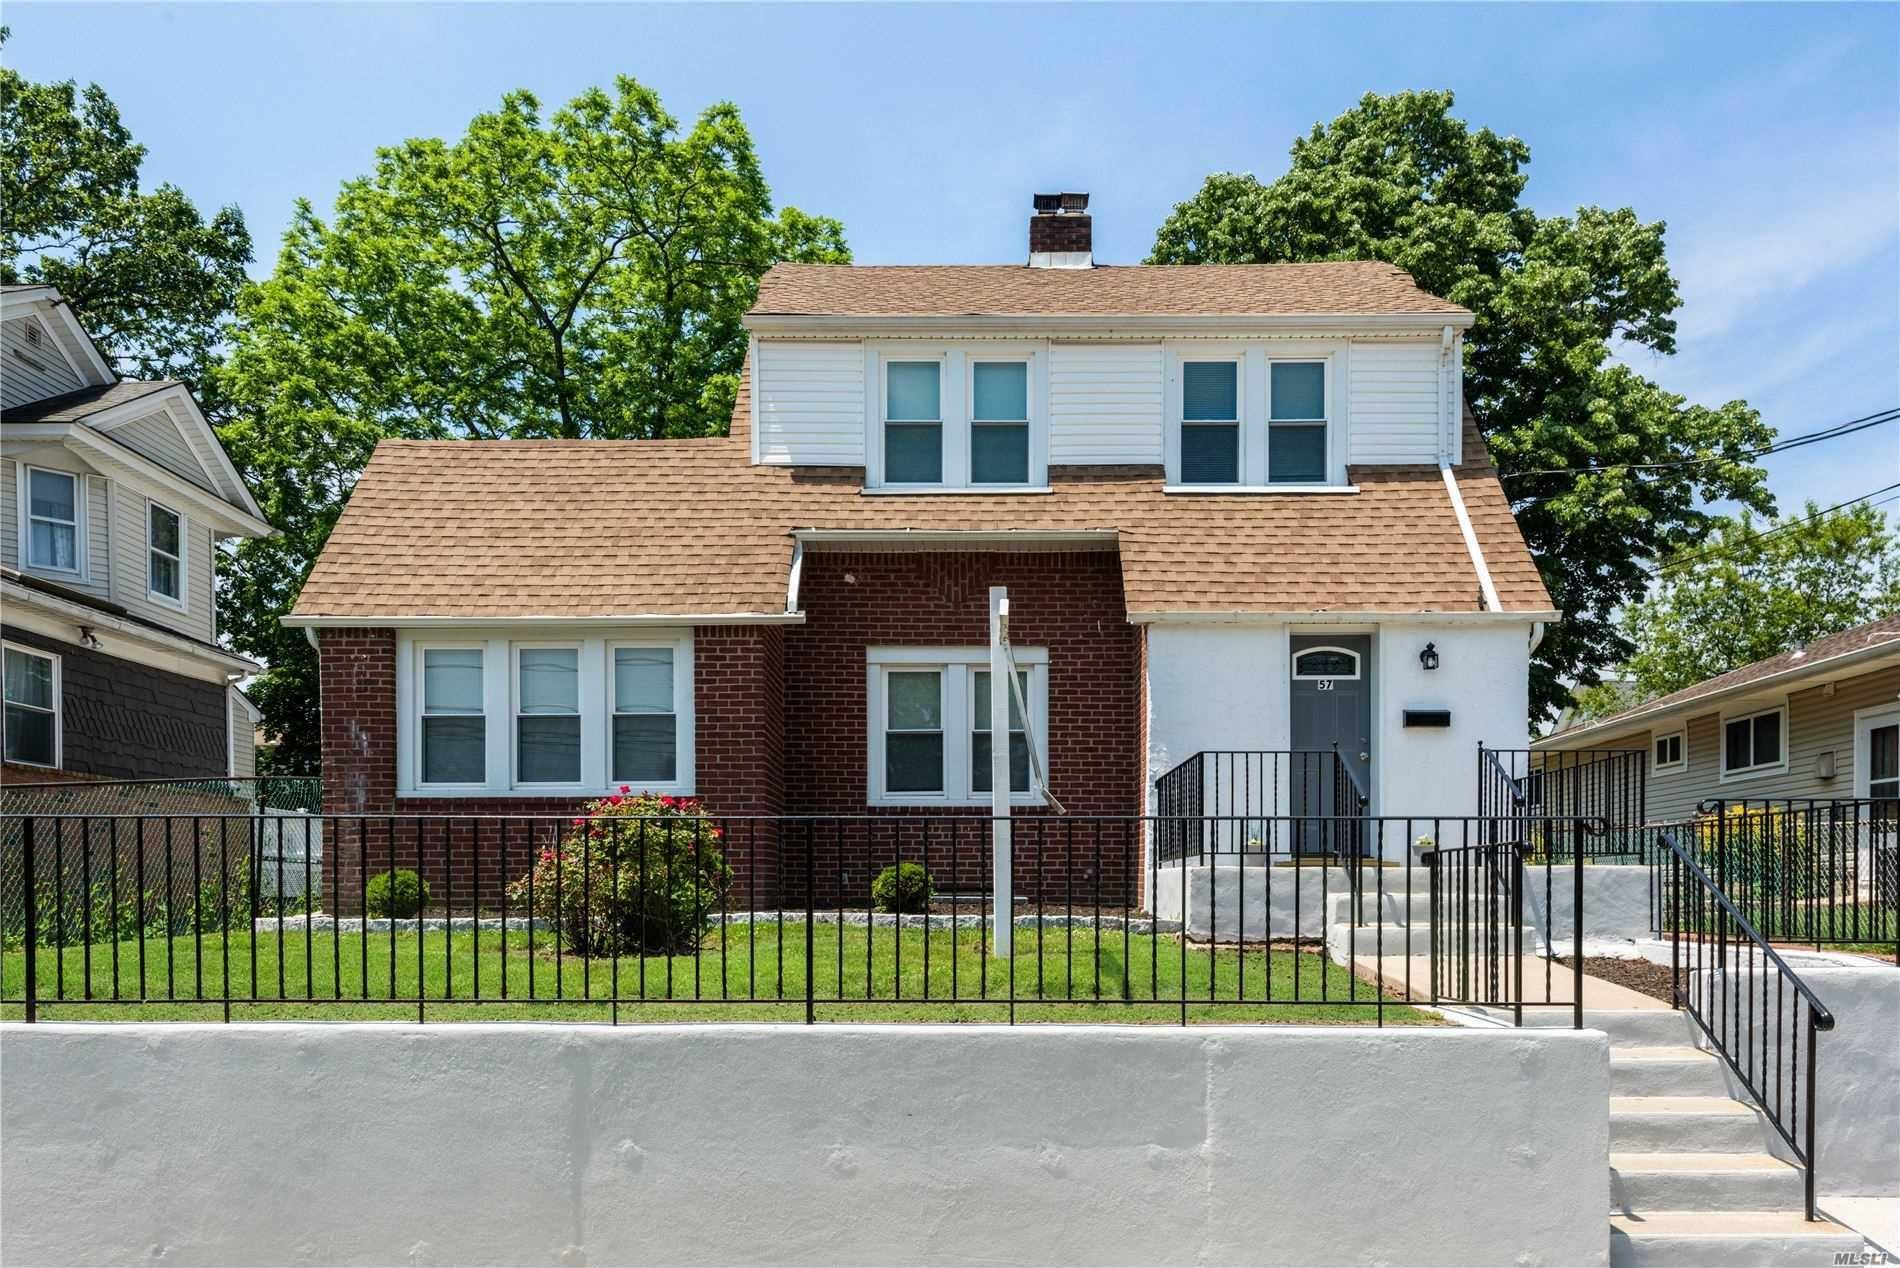 57 Frederick Avenue, Freeport, NY 11520 - MLS#: 3219737